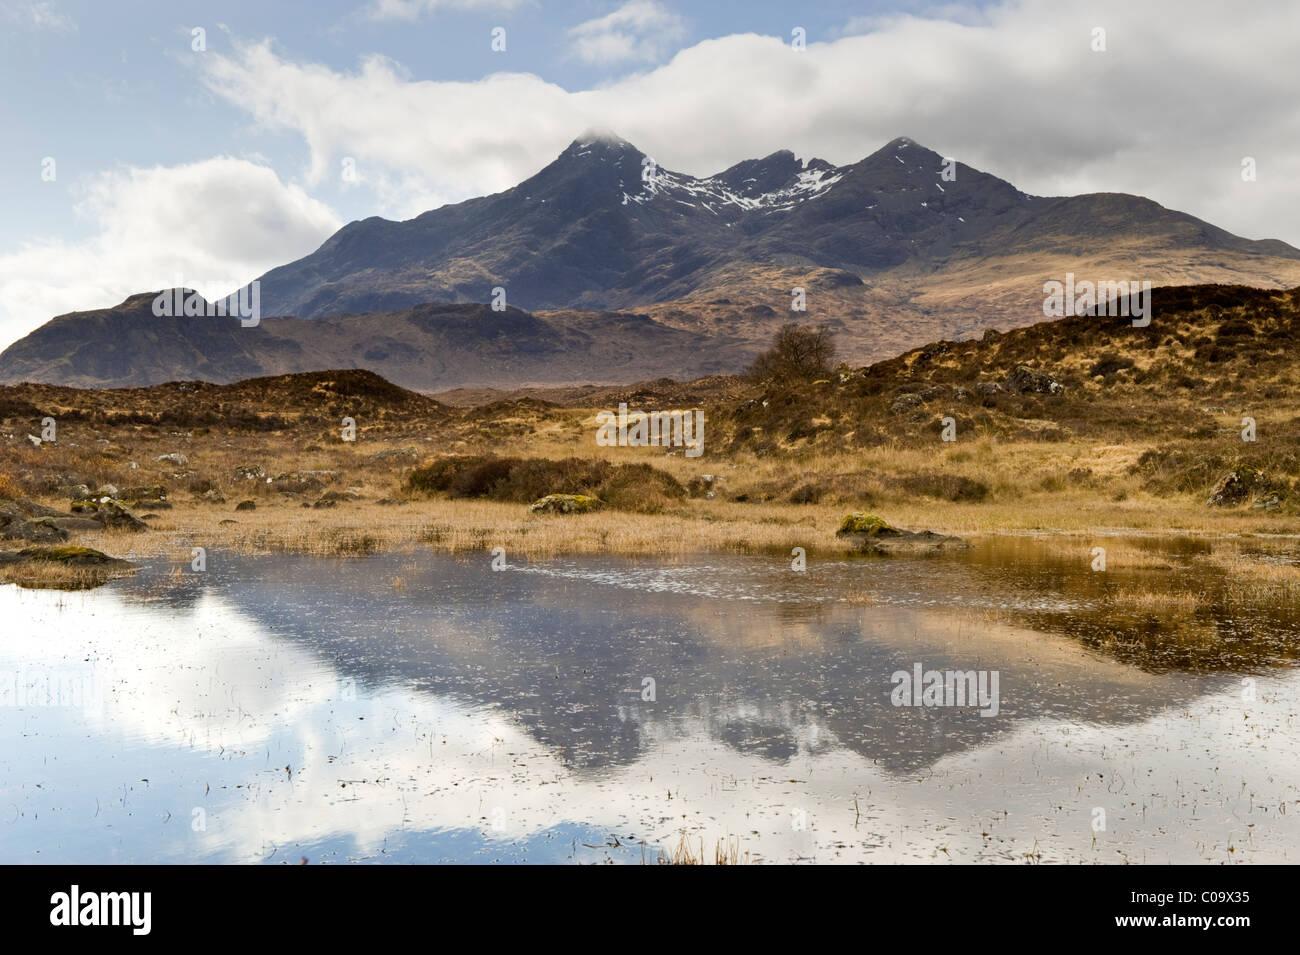 The Black Cuillin Hills from Sligachan, Sligachan, Isle of Skye, Inner Hebrides, Scotland, UK - Stock Image